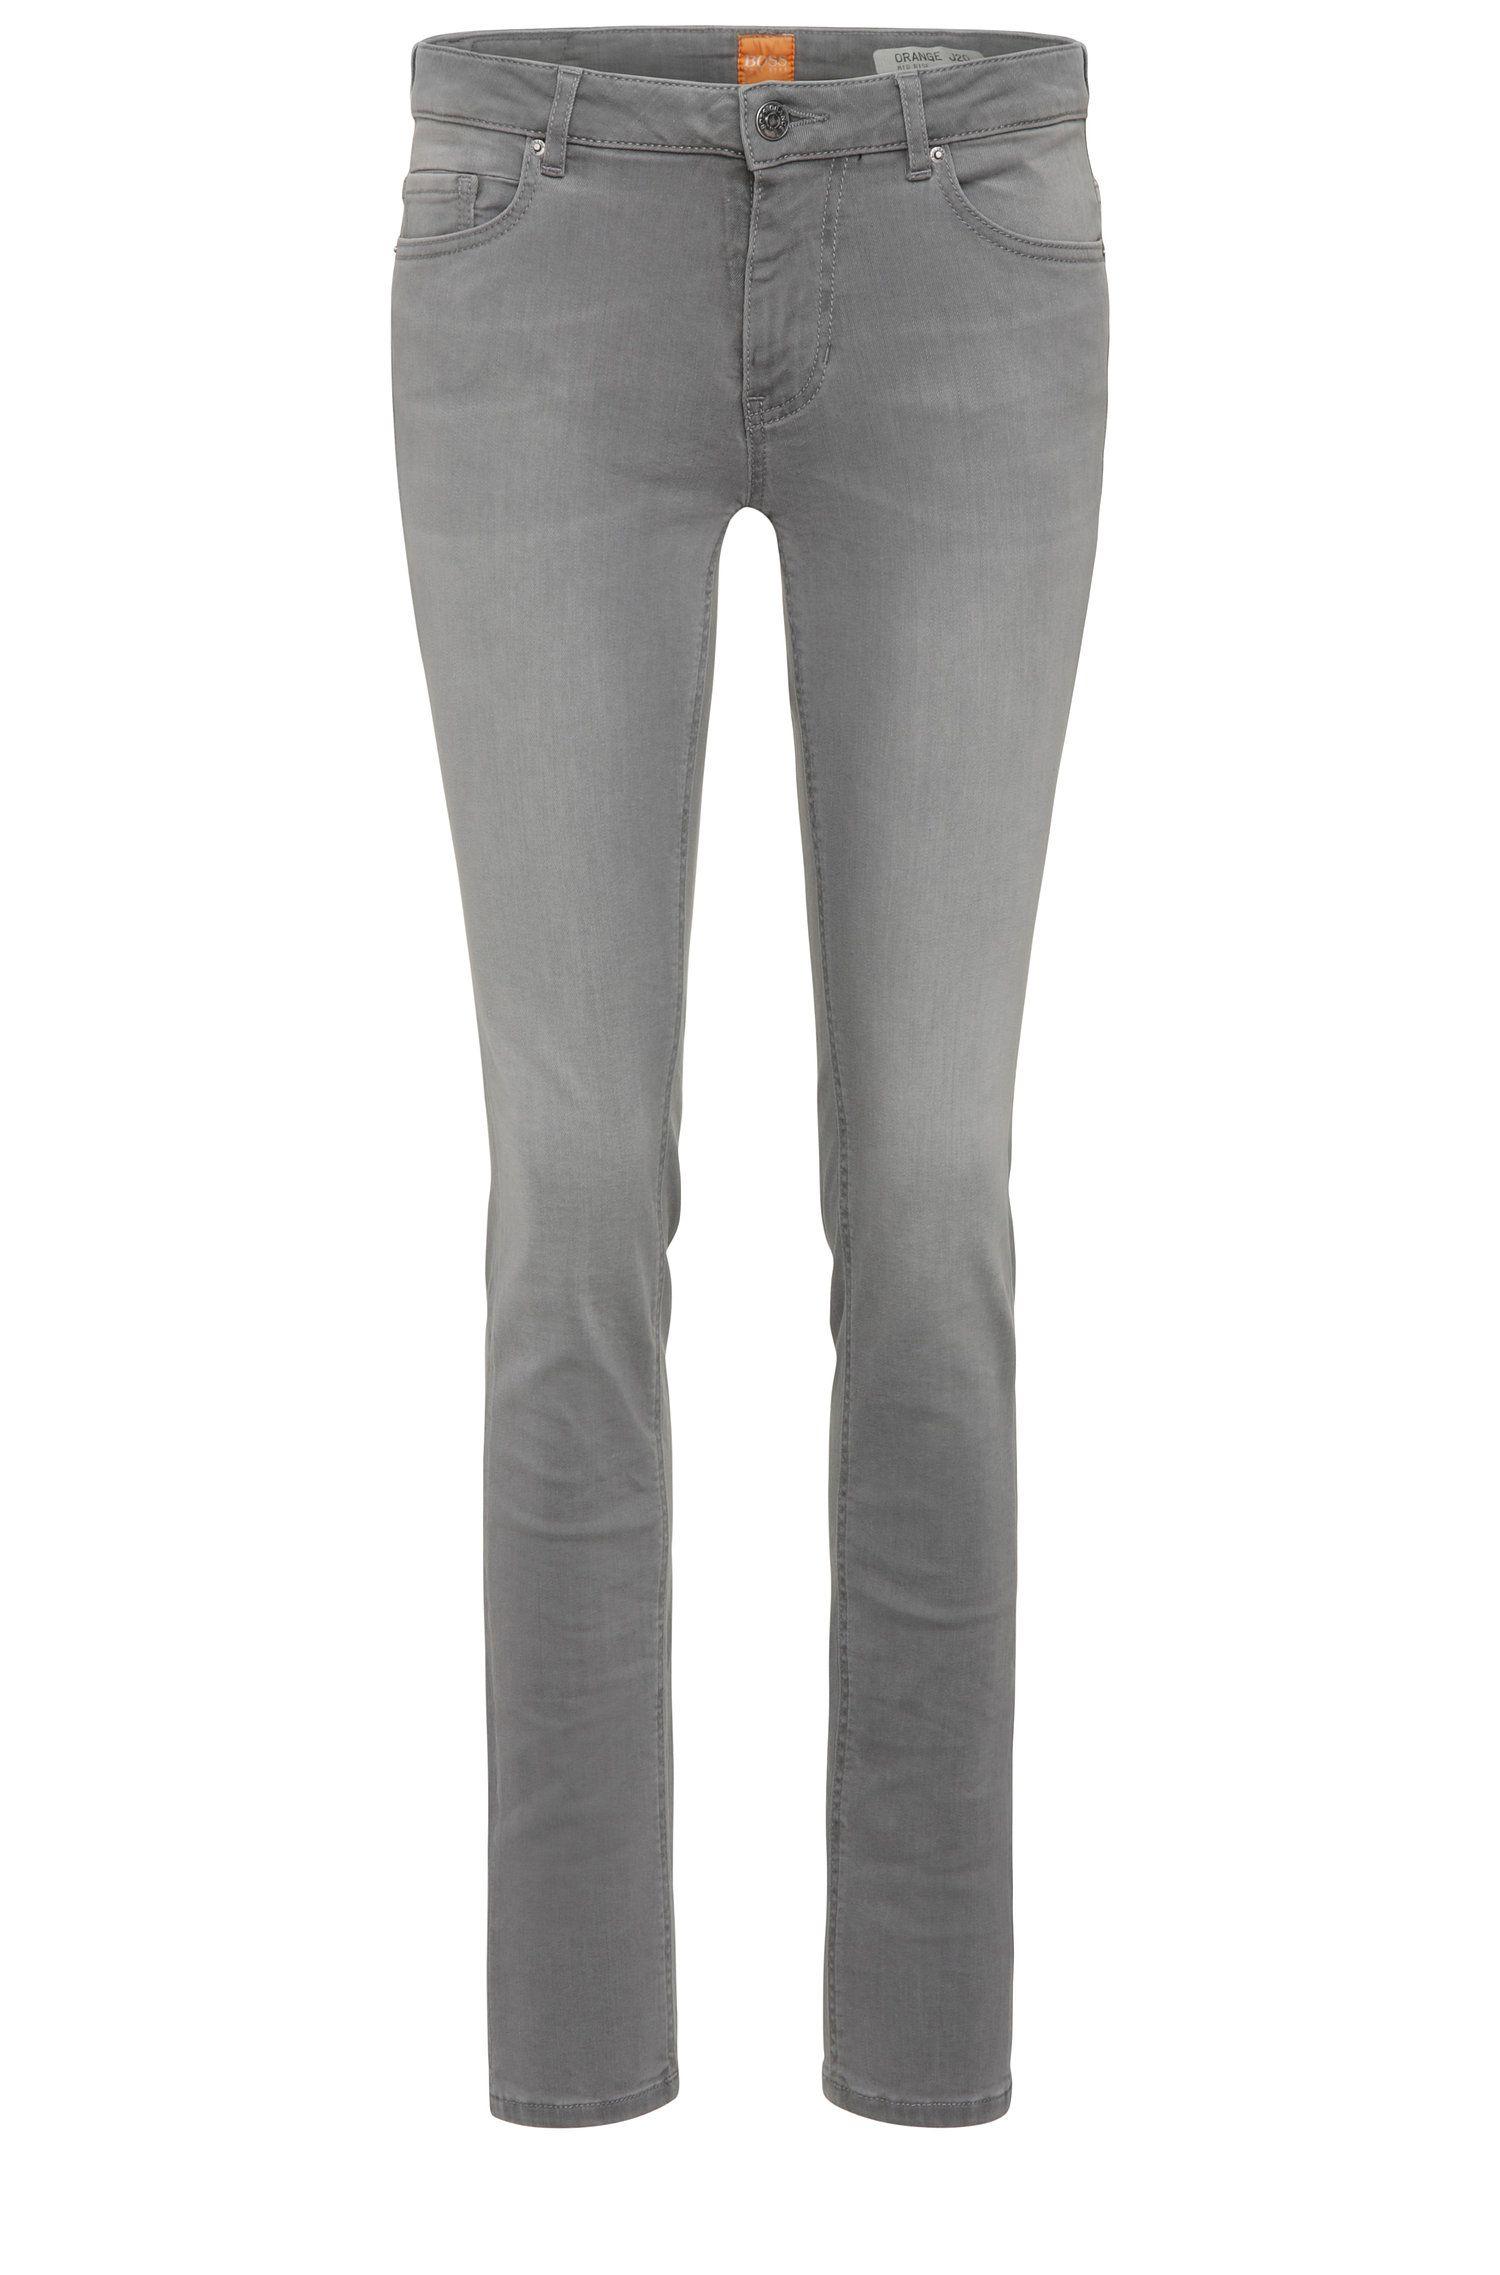 Slim-fit jeans in stretch-cotton blend: 'Orange J20 Sidney'